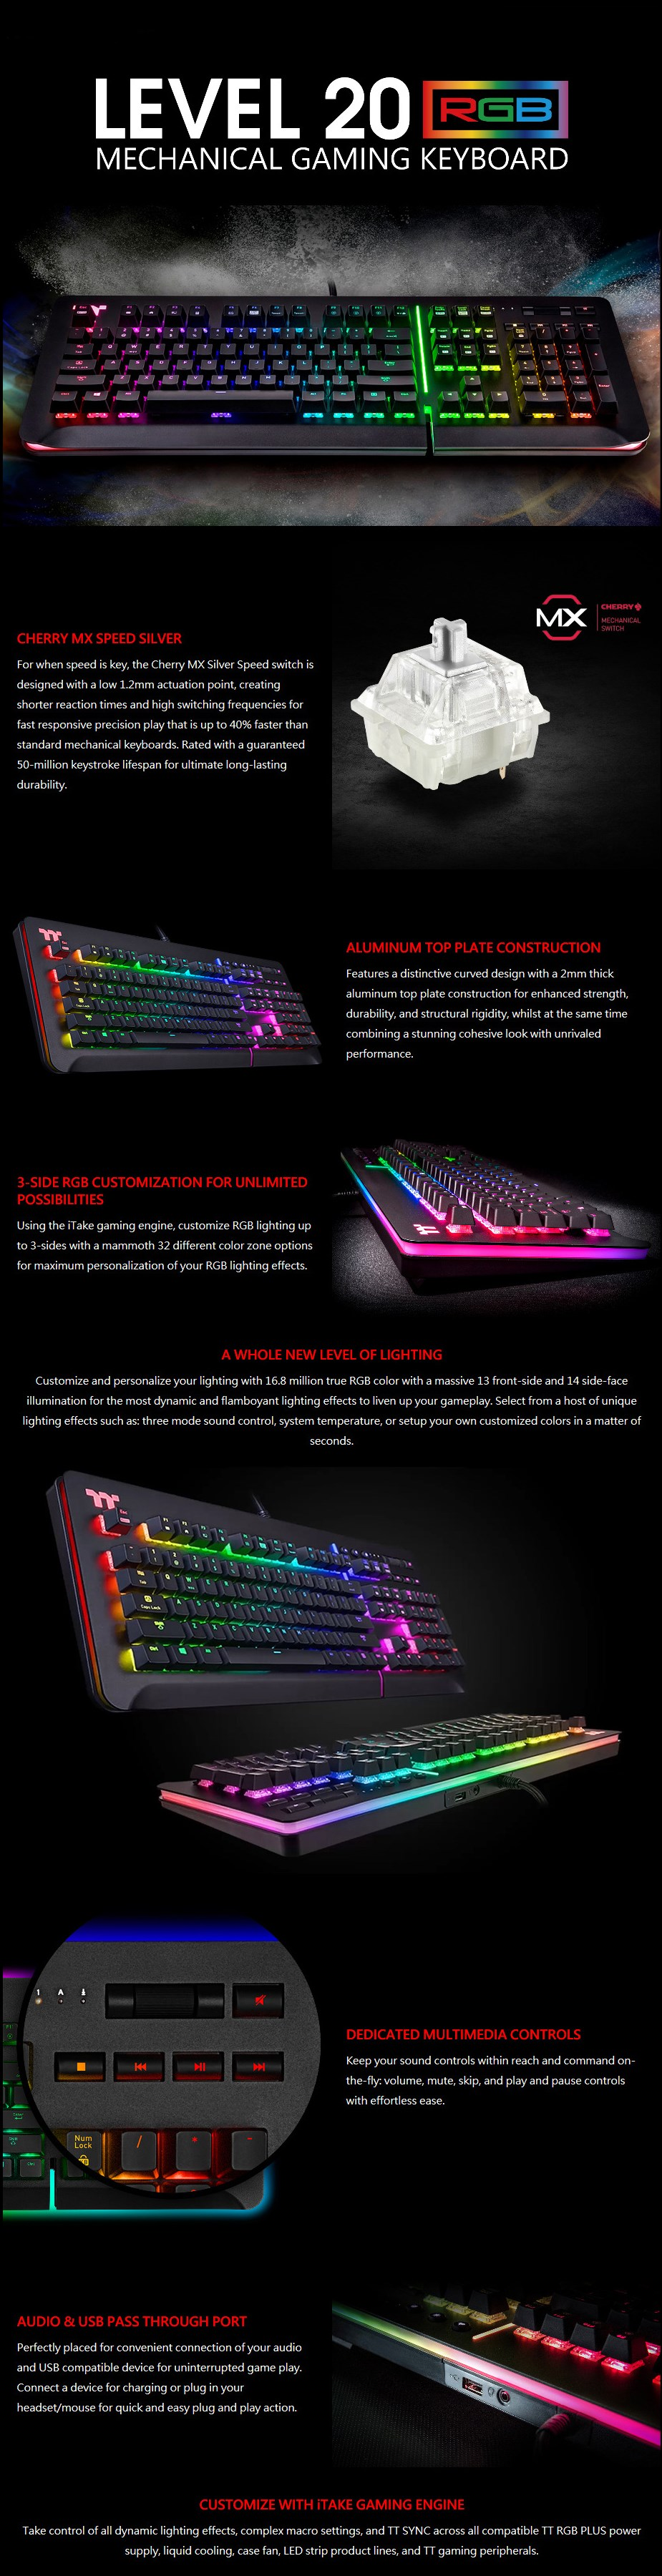 Thermaltake Level 20 RGB Mechanical Gaming Keyboard - Cherry MX Speed Silver